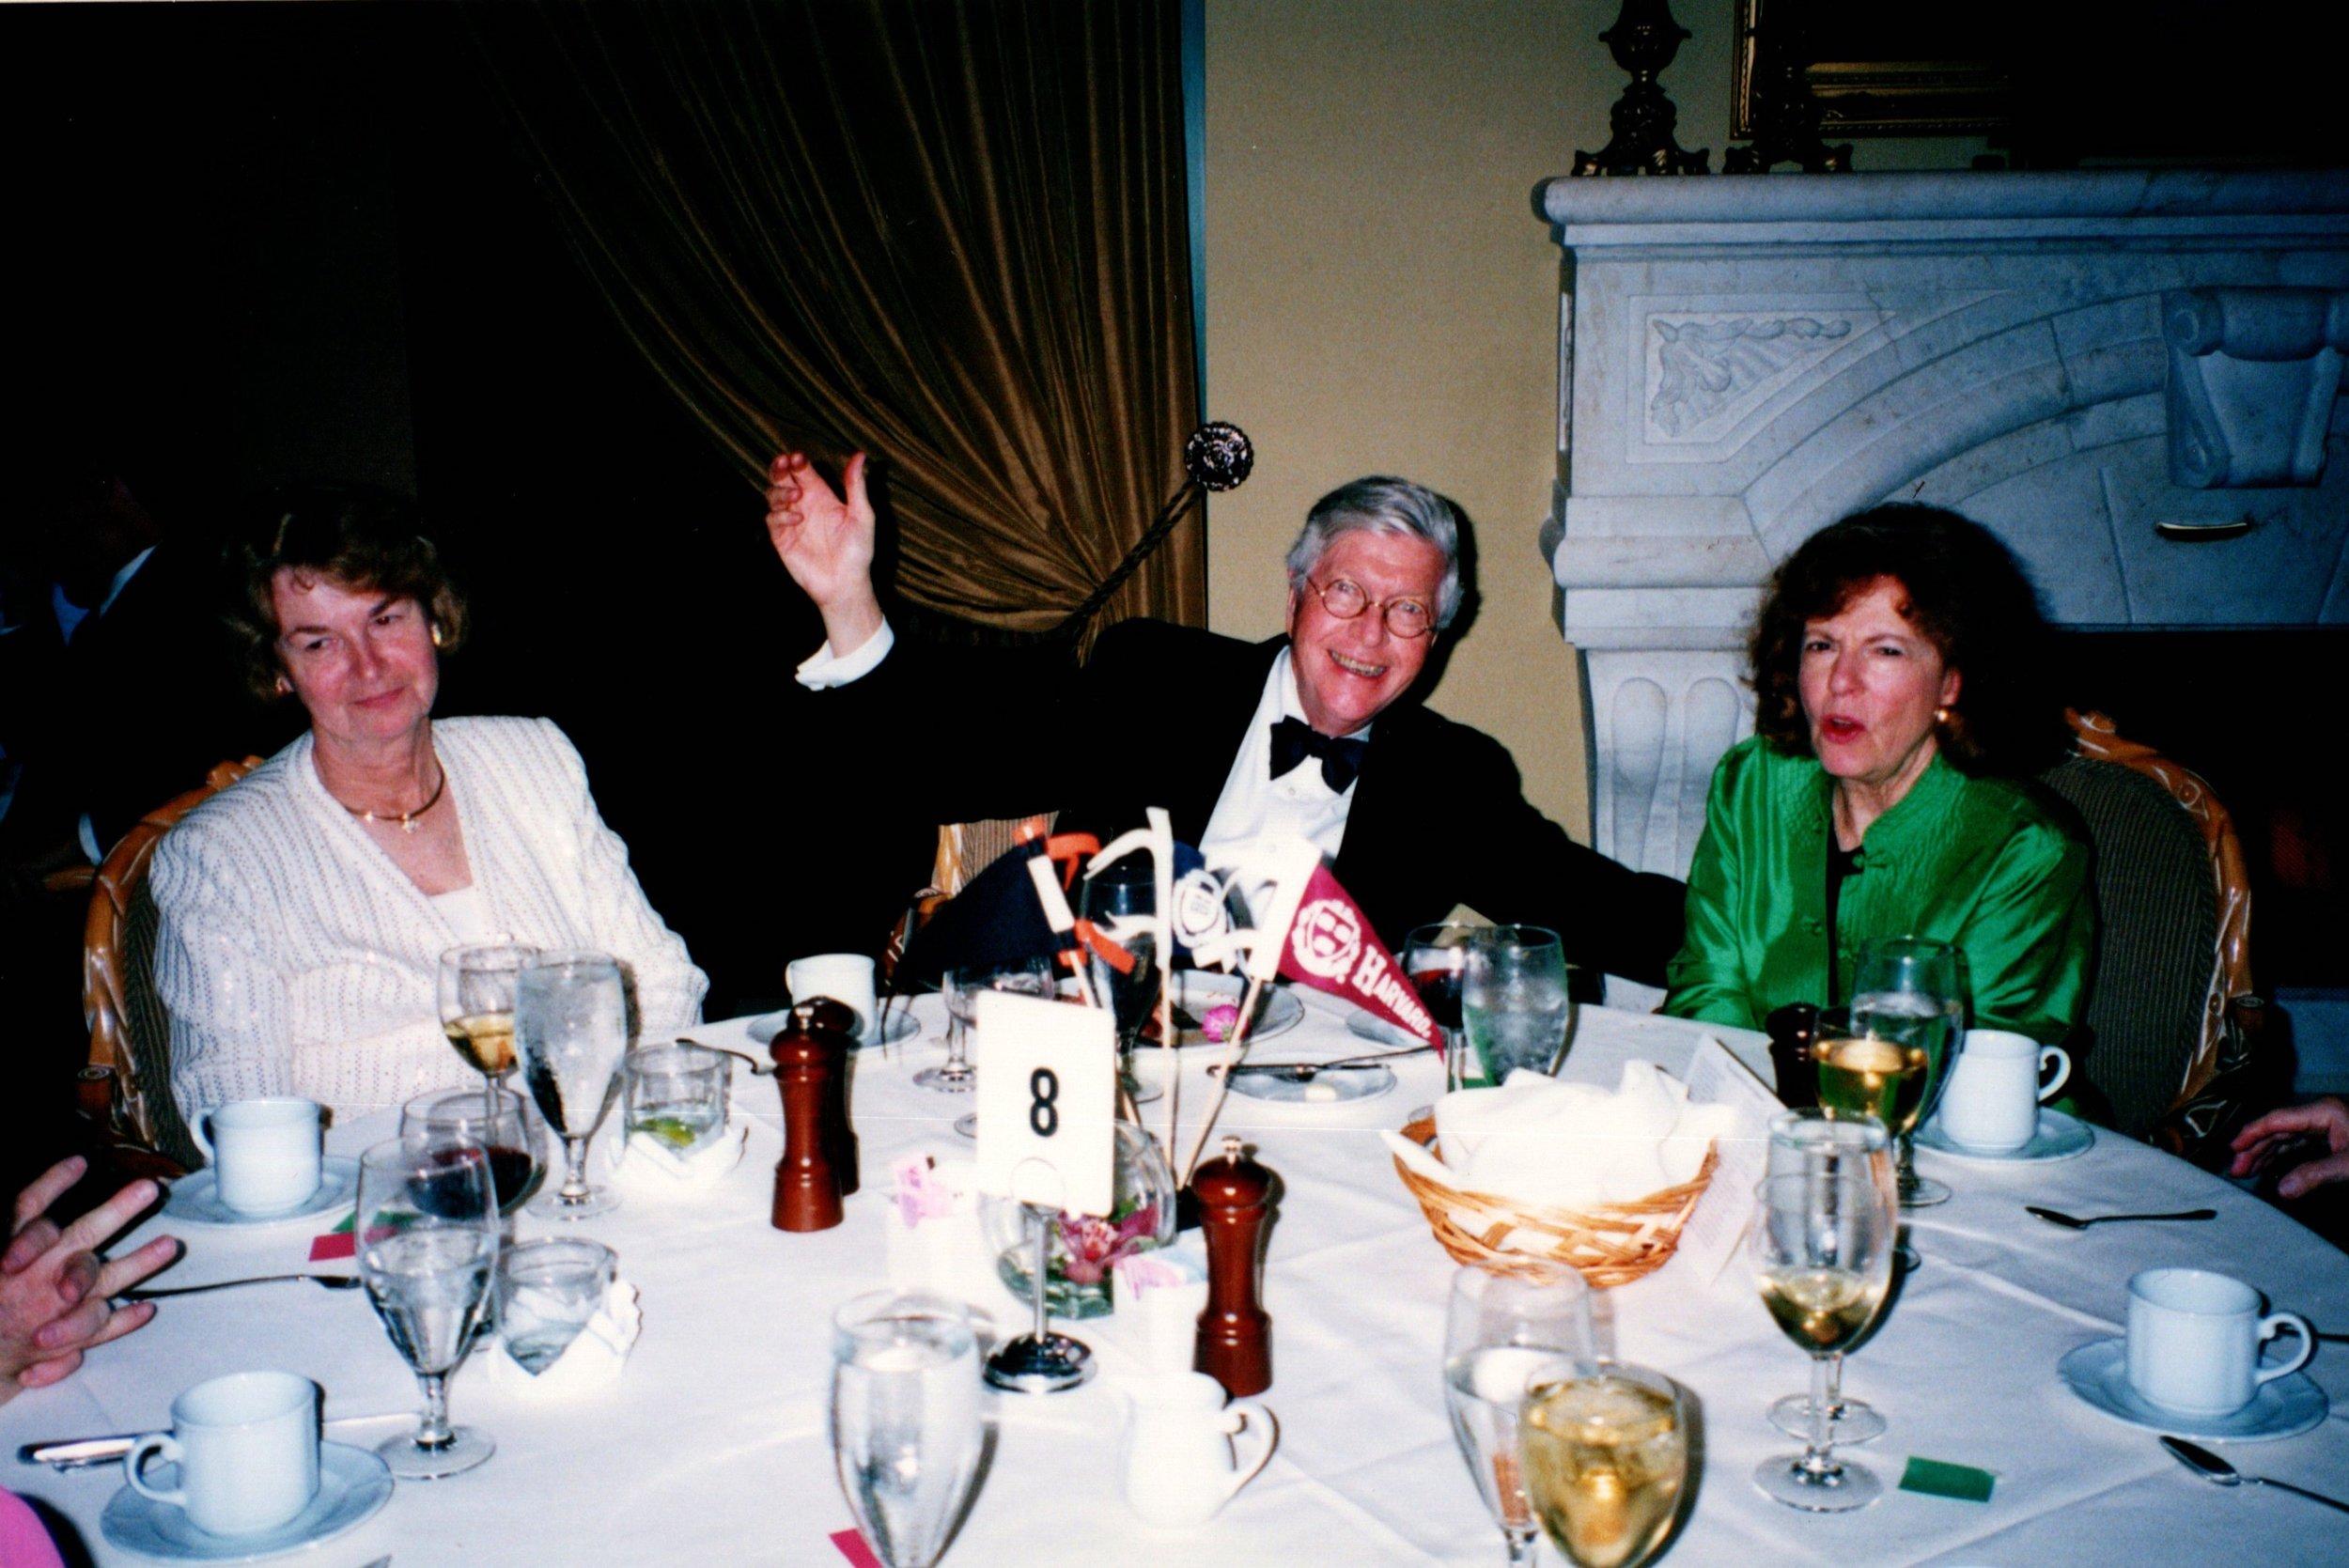 2_11_2002 - HYP DINNER DANCE - VINEYARD COUNTRY CLUB 2.jpg